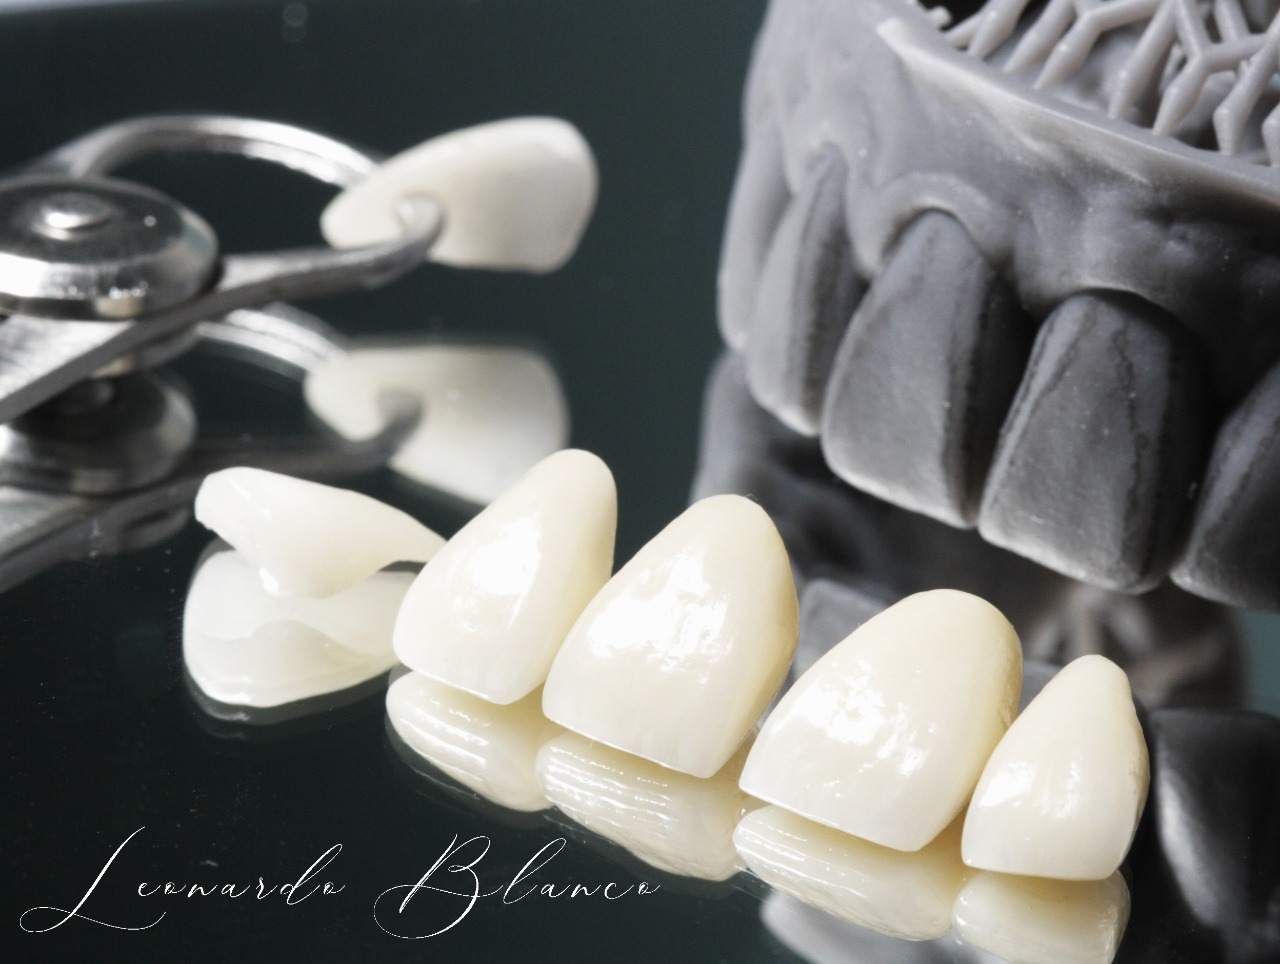 ente-contato-dental-maringa